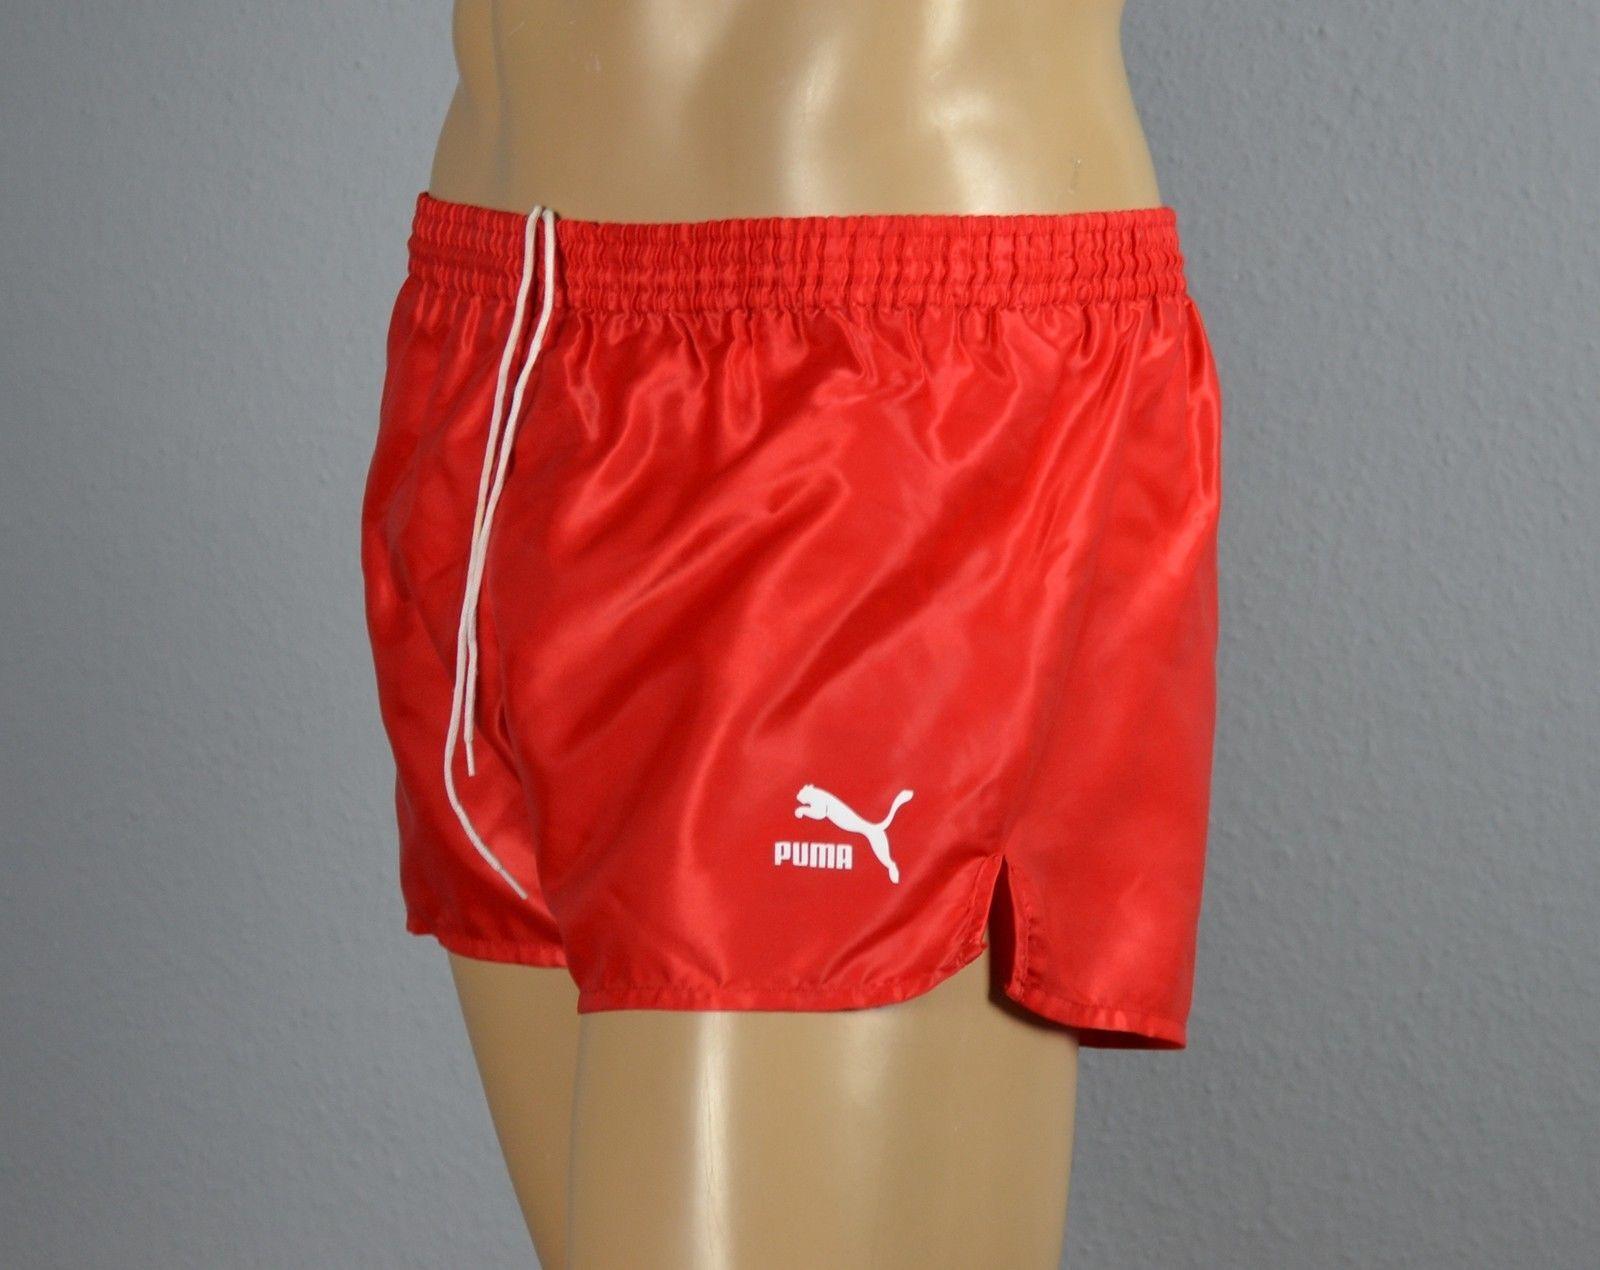 PUMA Glanz Nylon Shorts Sporthose Short red-G. M-5                . (697)